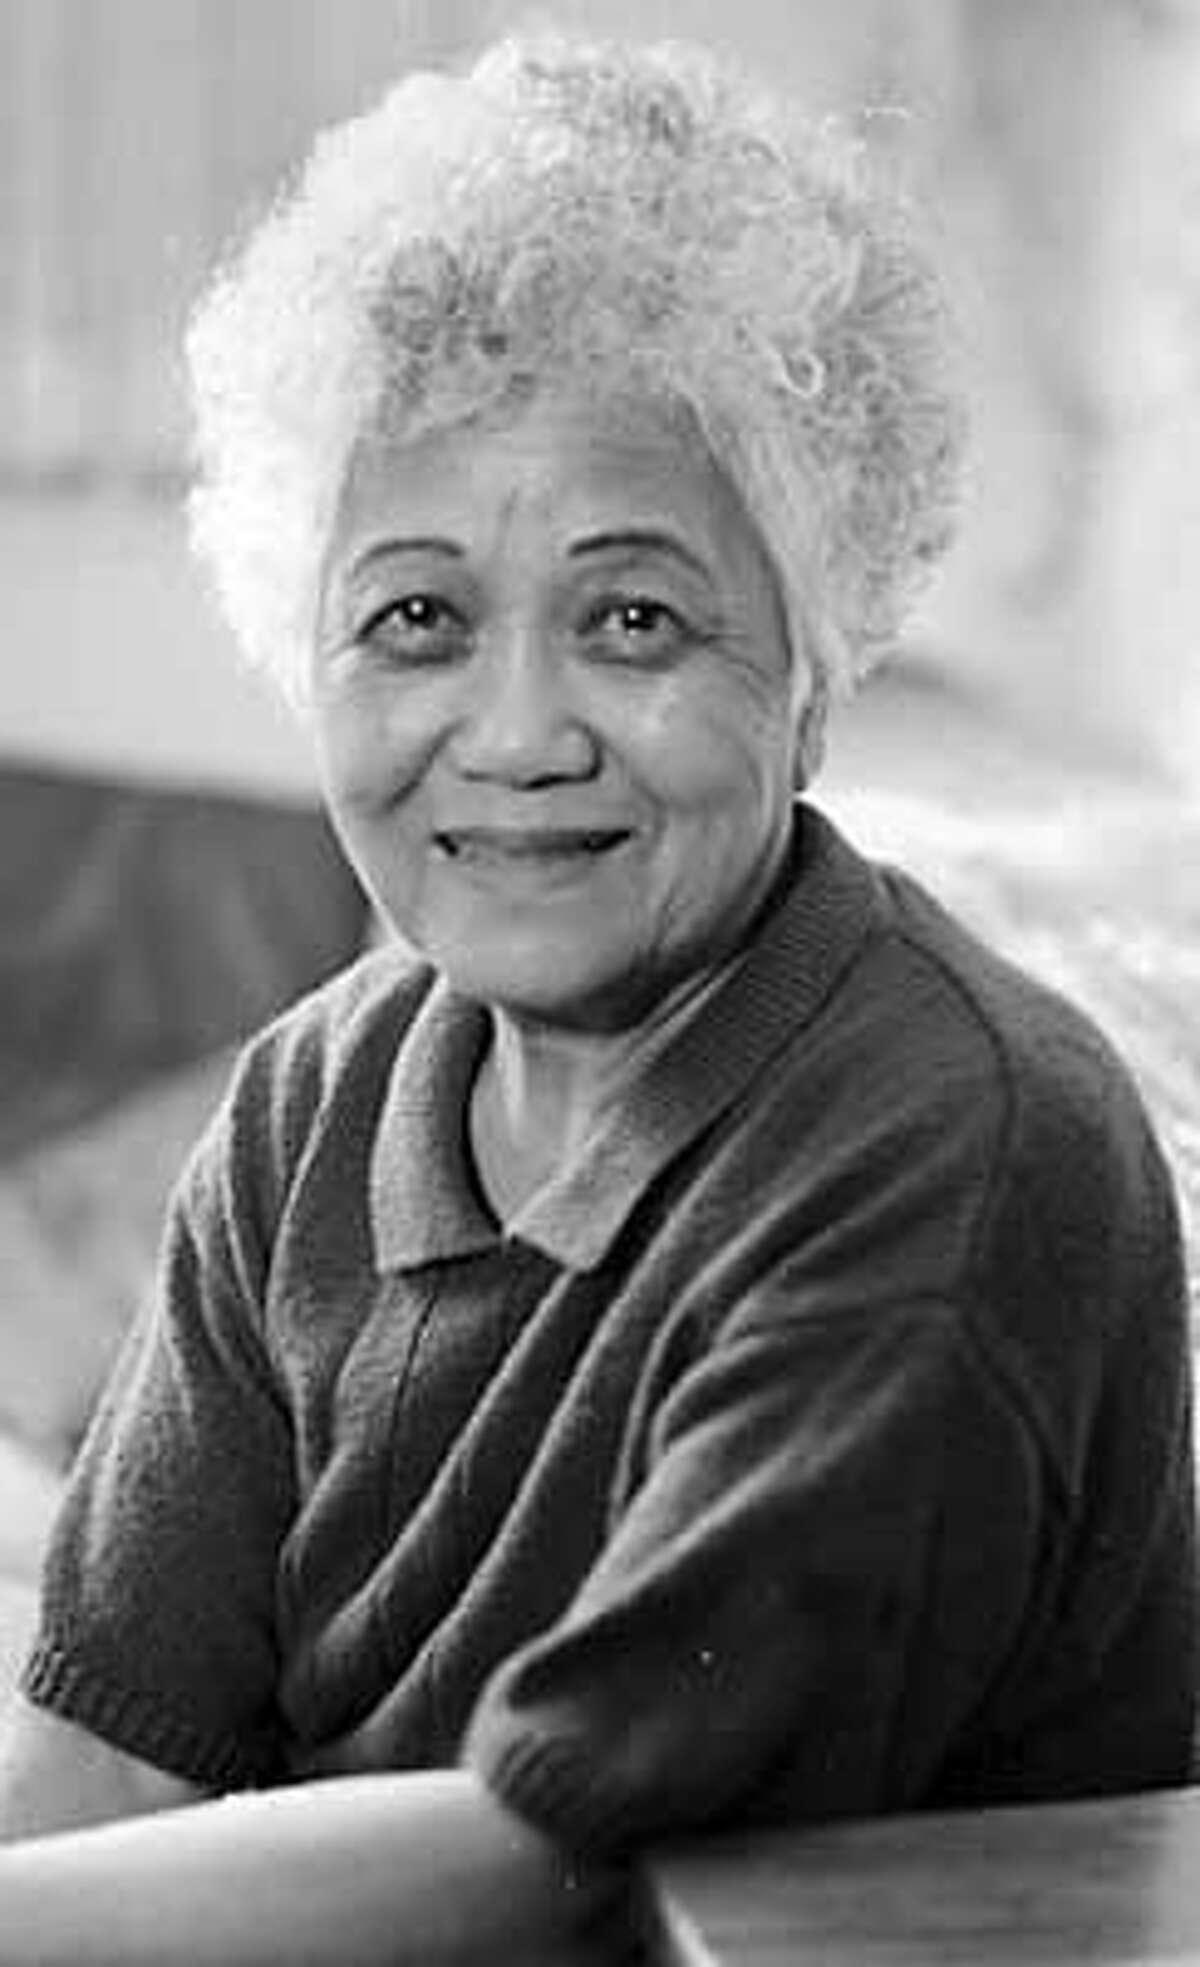 Obituary photo of Tsuyako Kitashima. Ran on: 01-10-2006 Tsuyako Kitashima worked for redress for Japanese Americans who were interned.